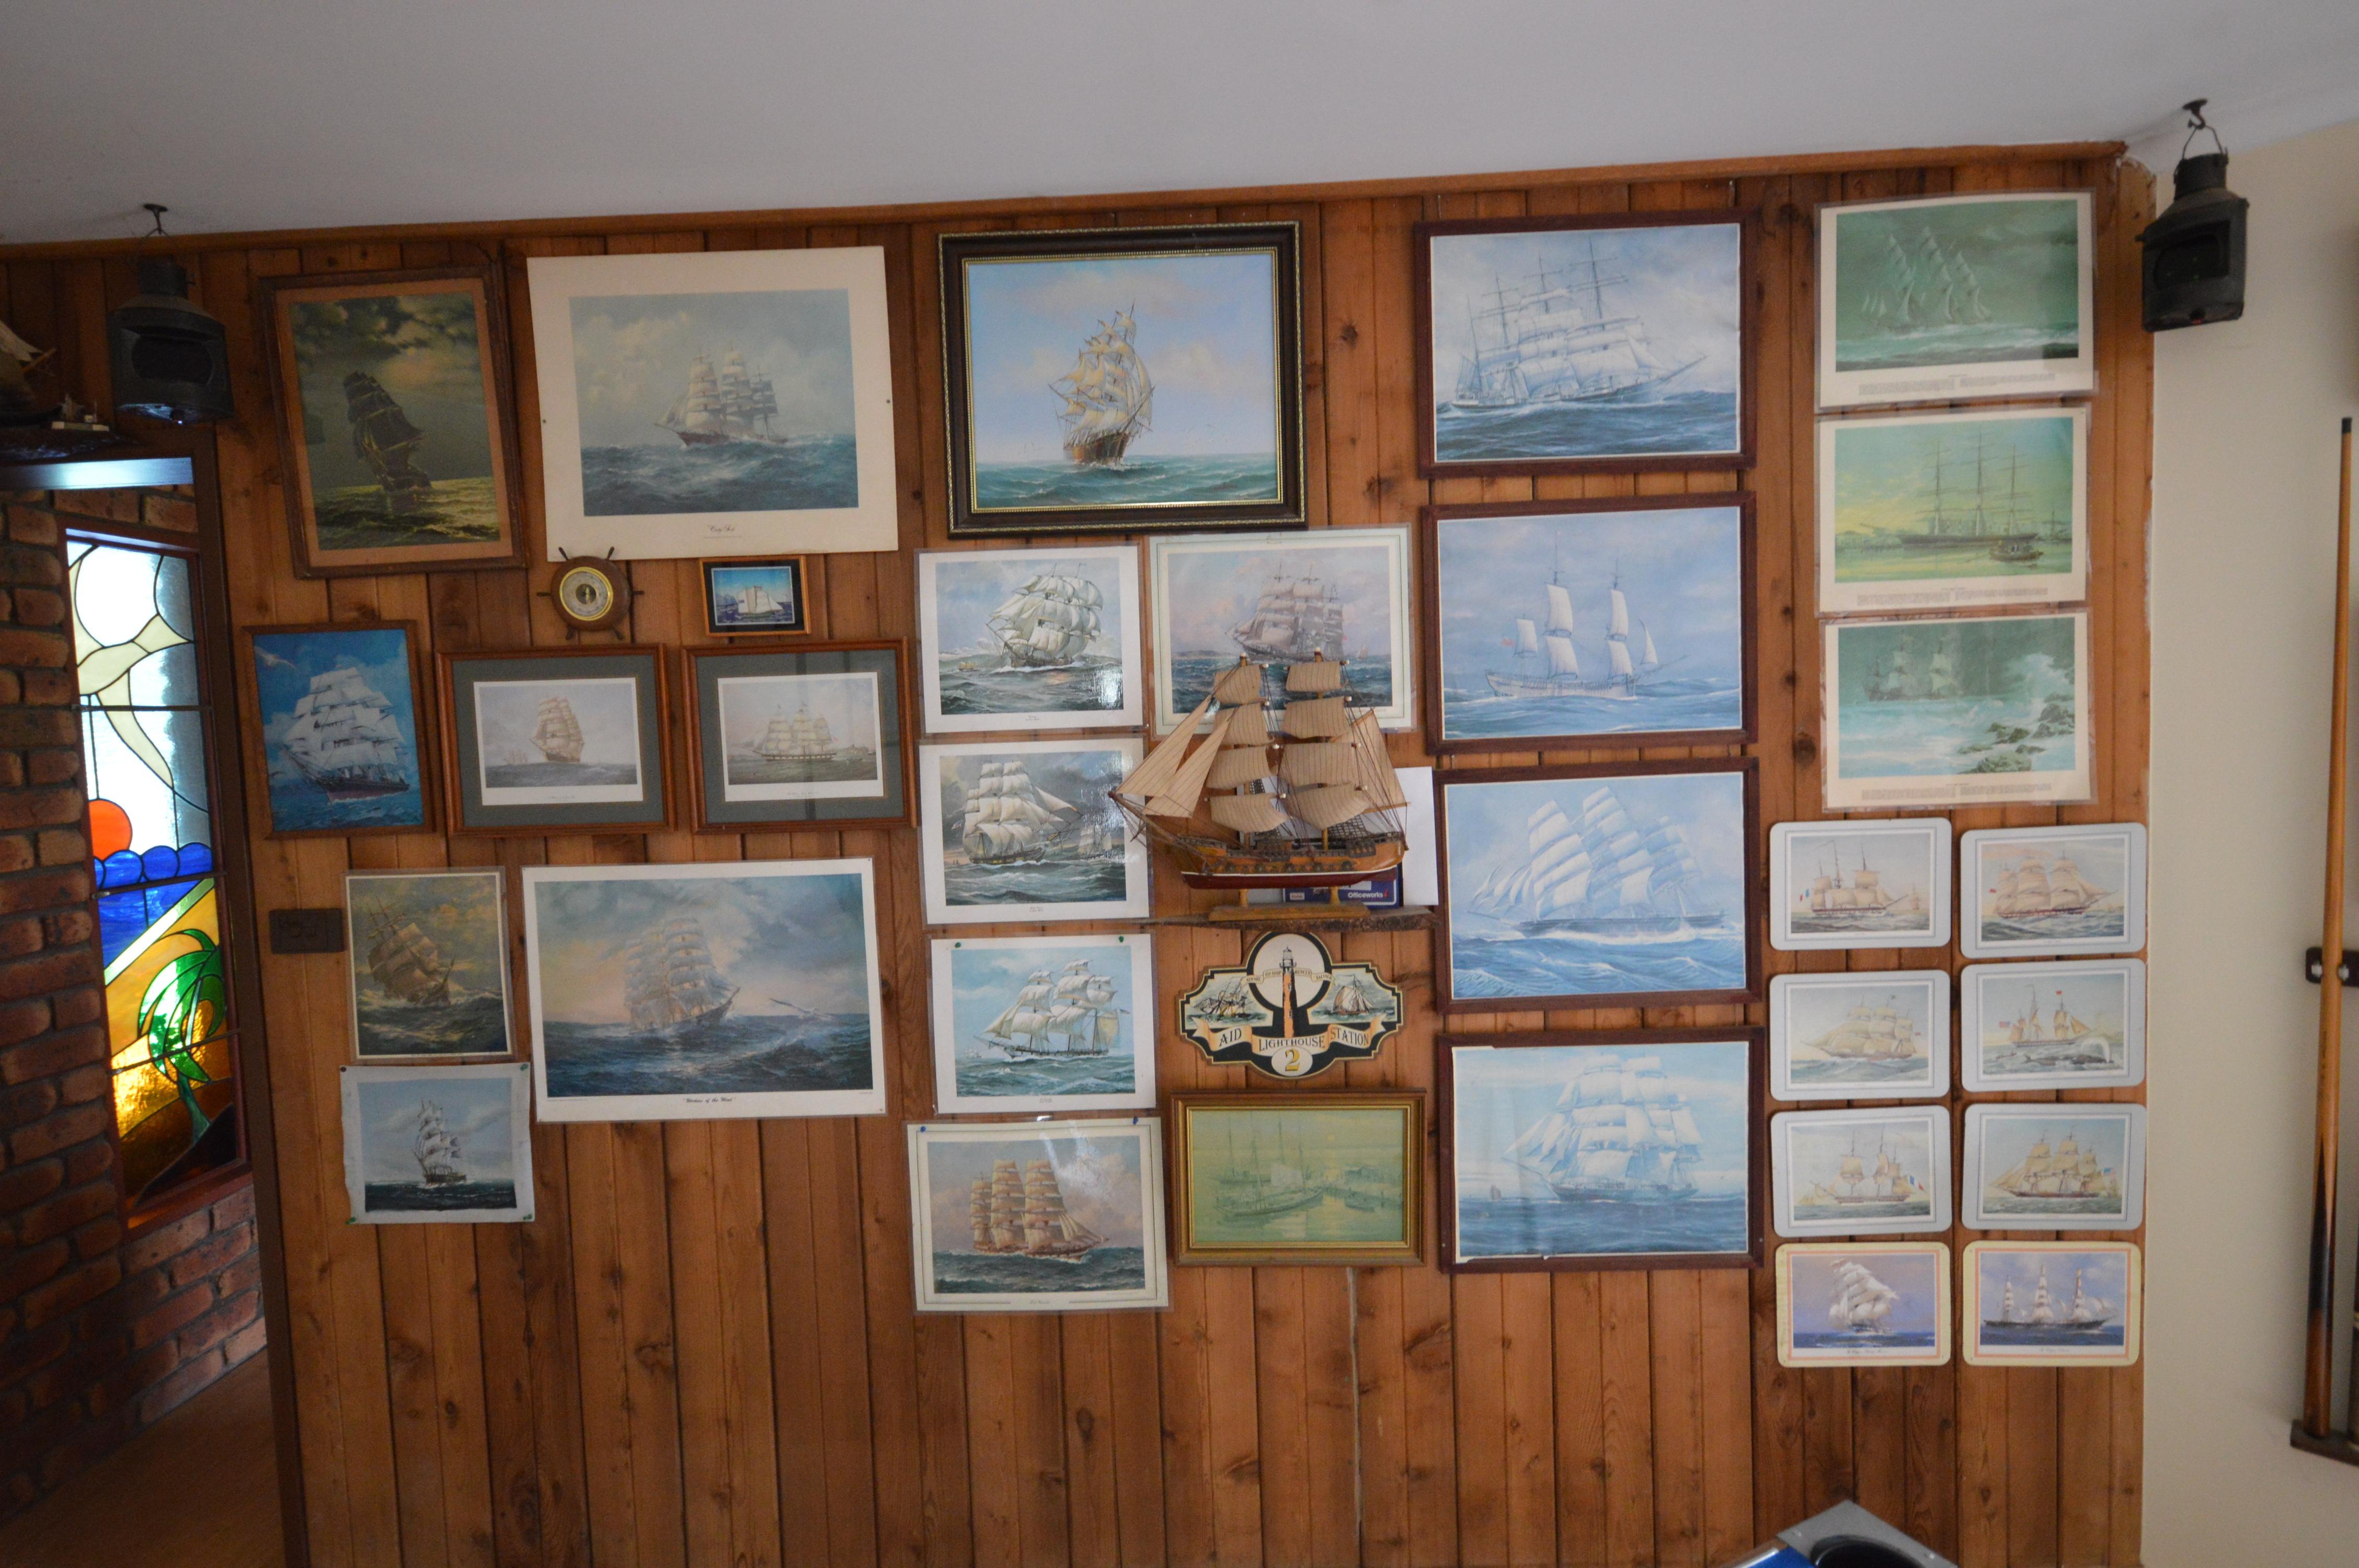 Old sailing ship pictures, models, light, barometers